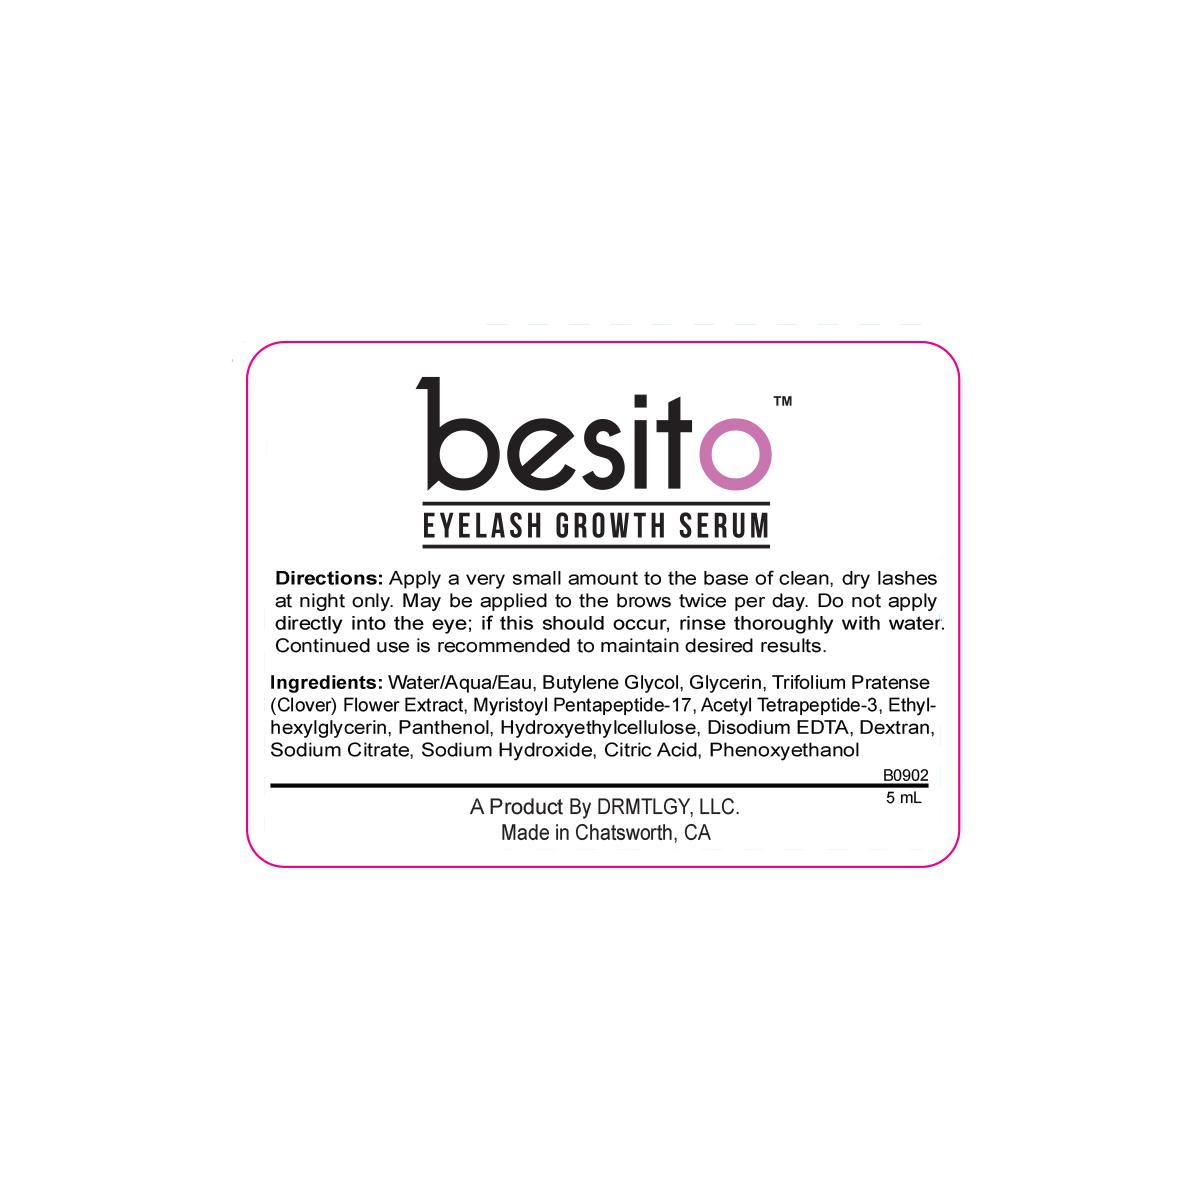 491e5f41511 besito Eyelash Growth Serum - 100% Natural Lash Growth Serum for Full Lash  and Brow Growth. Made in the USA - Walmart.com